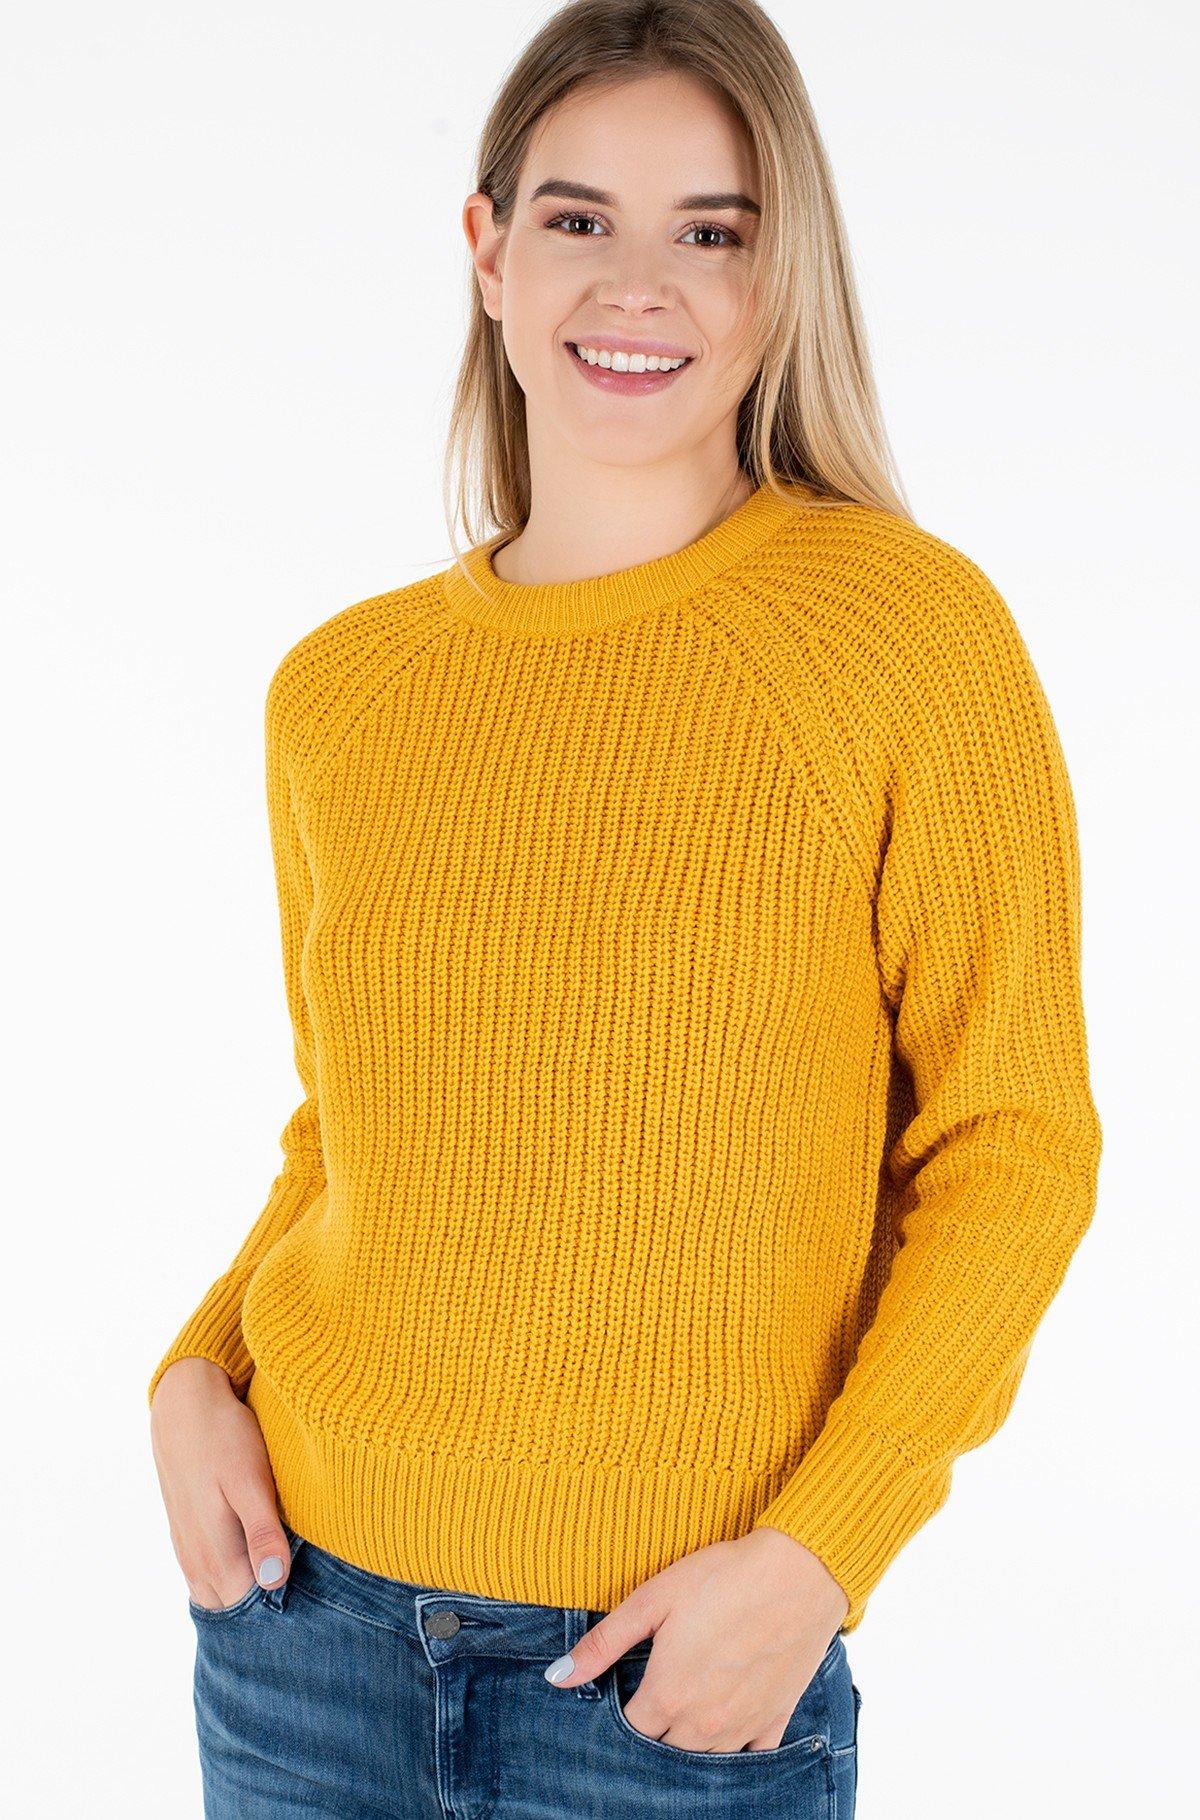 Sweater 1021140-full-1